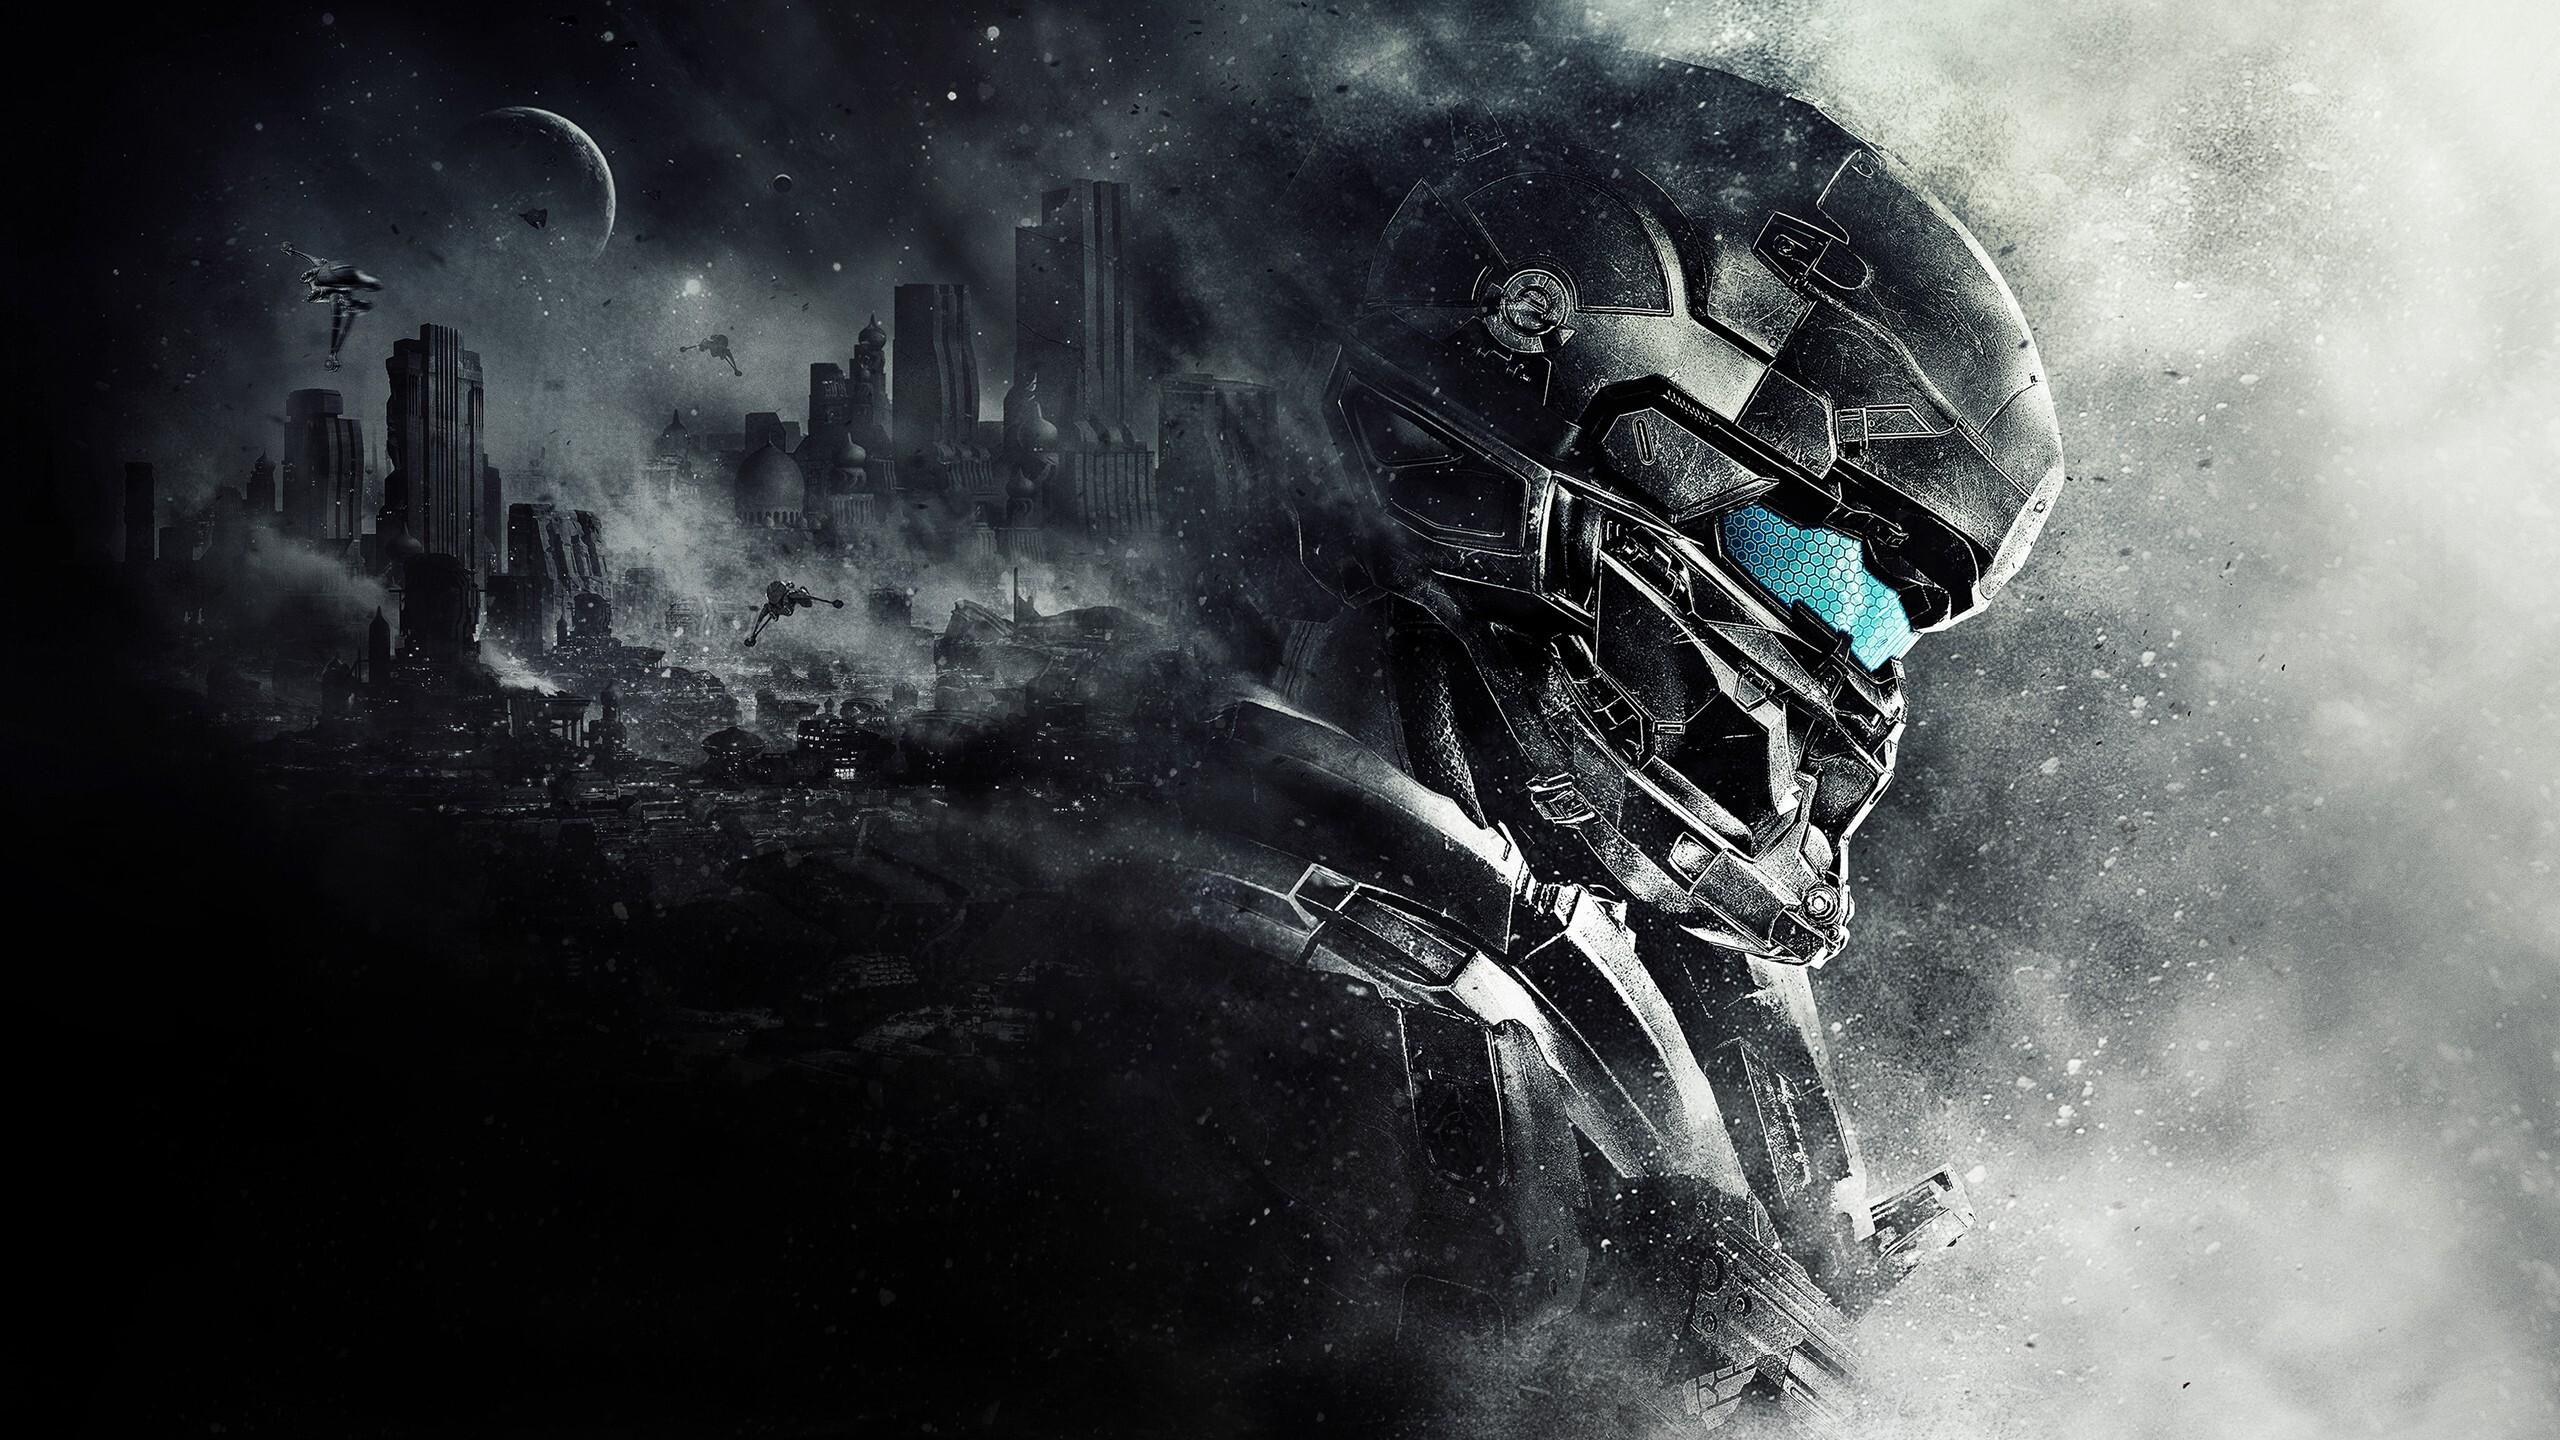 1440p Wallpaper Girls 2560x1440 Spartan Locke Halo 5 1440p Resolution Hd 4k